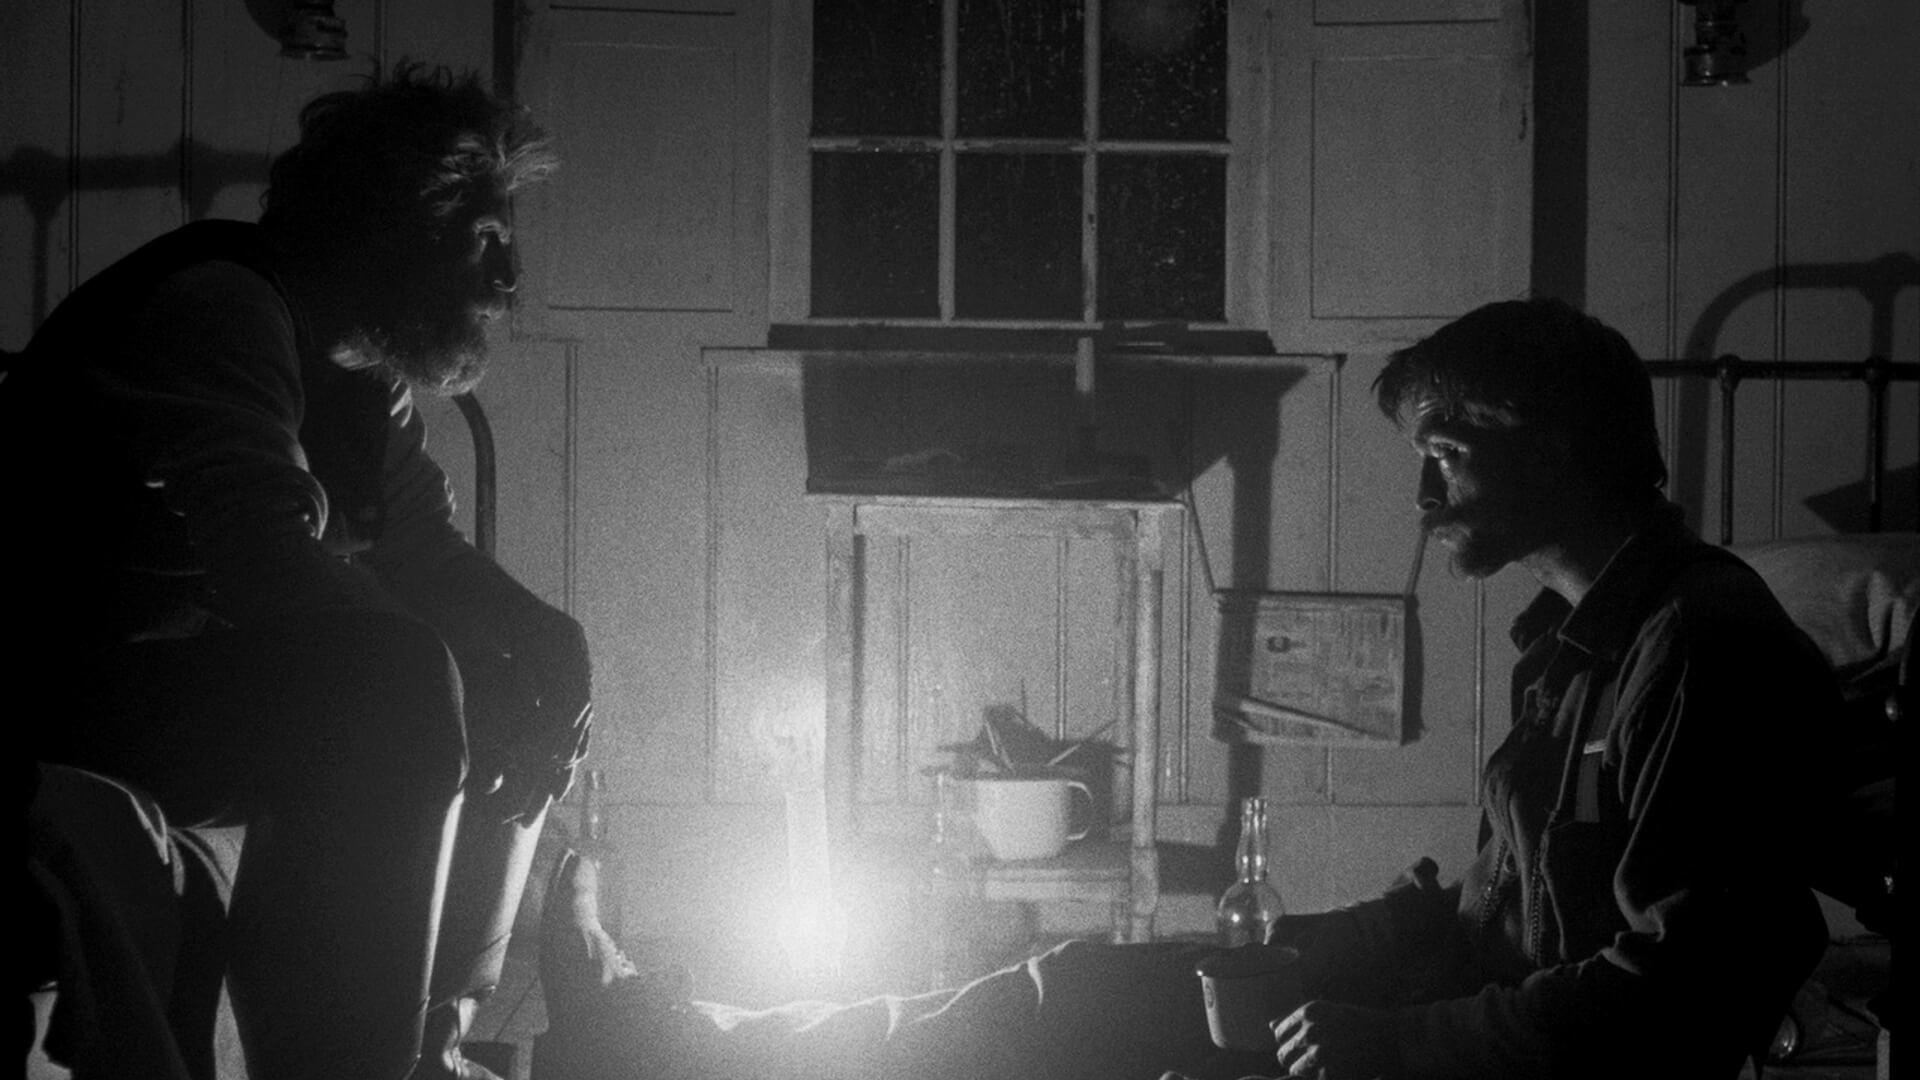 A24、狂気の問題作『ライトハウス』が7月日本公開!シーン写真4点解禁&特典付きムビチケ発売決定 film210326_thelighthouse_4